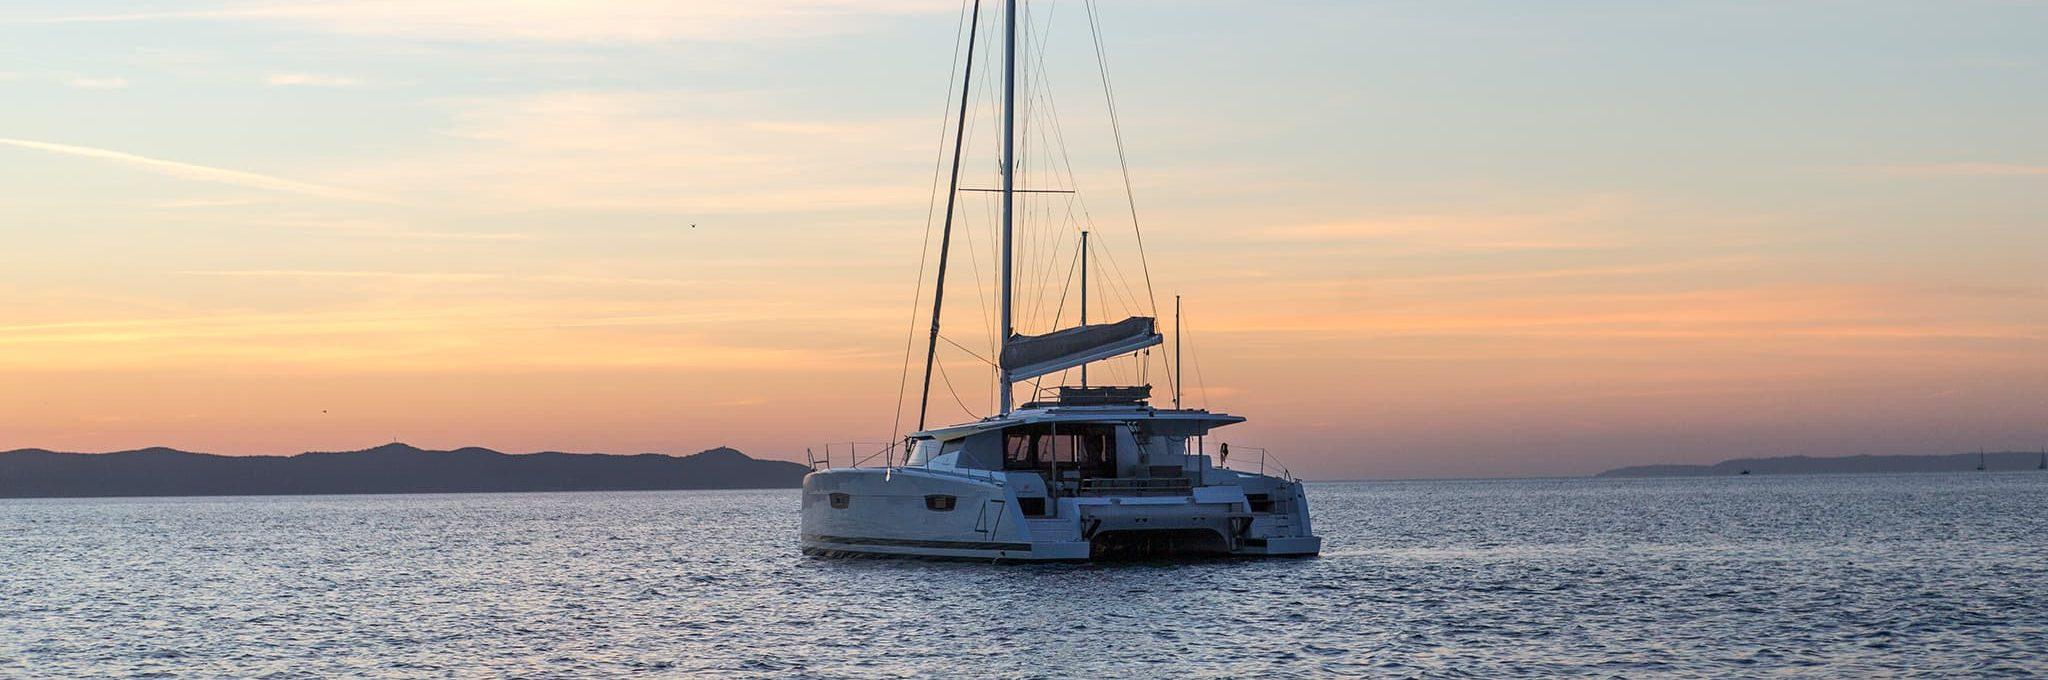 A catamaran sailing on an open body of water